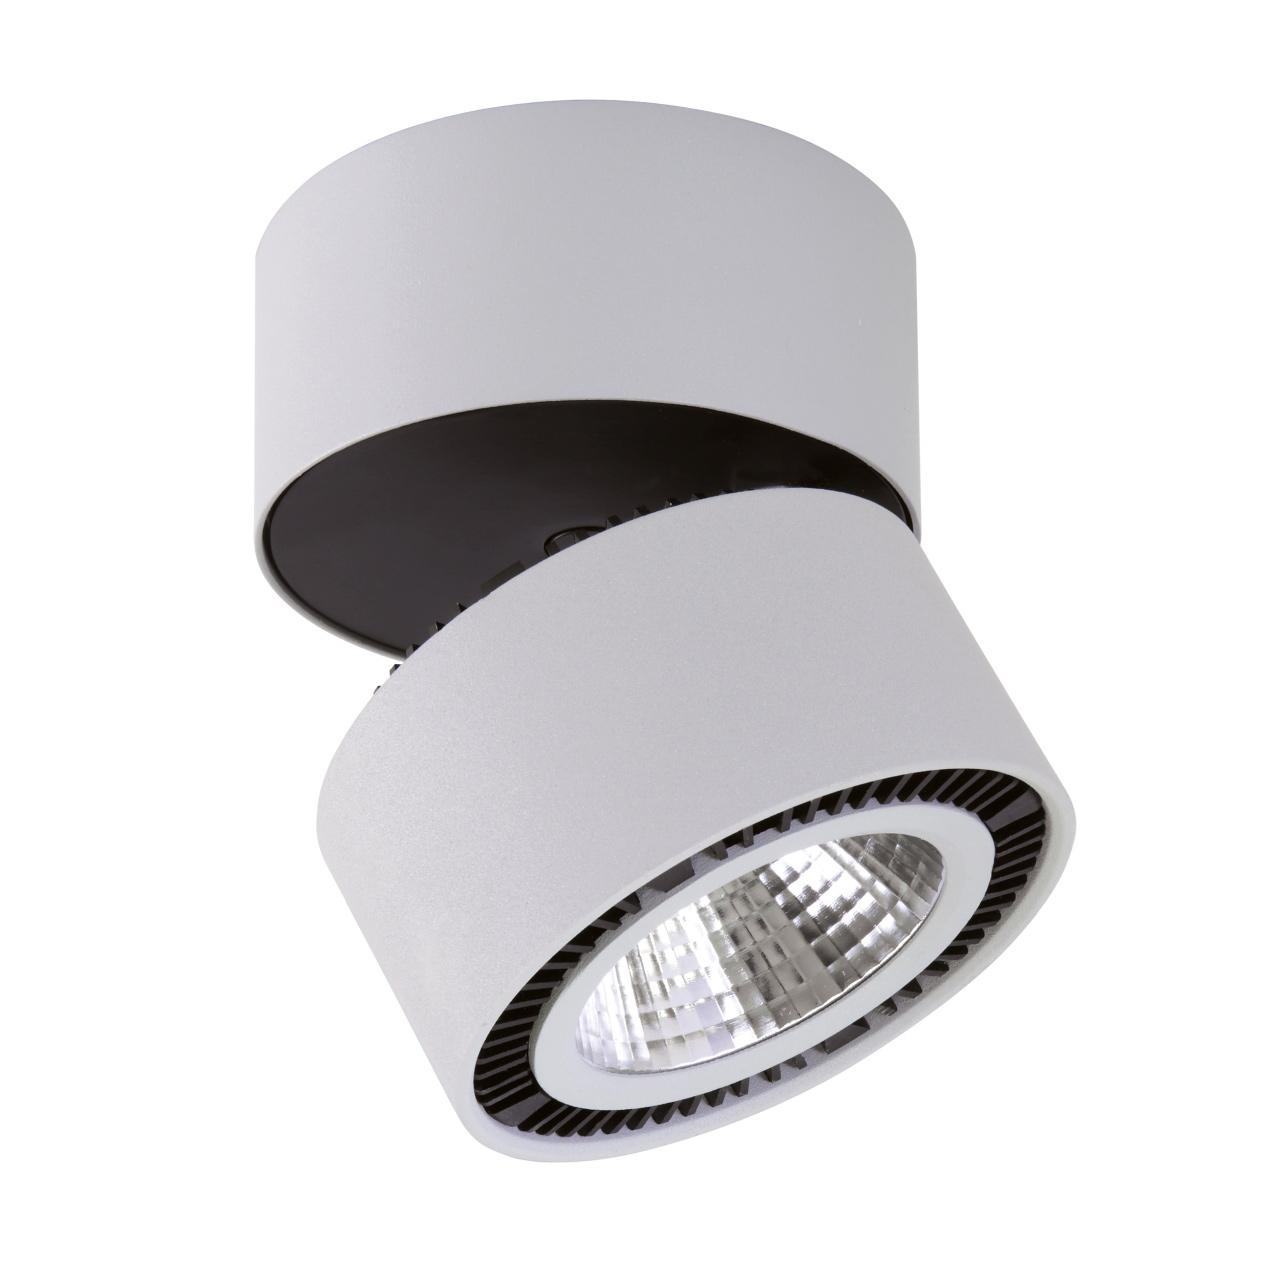 Светильник Forte Muro LED 40W 3400LM 30G серый 3000K Lightstar 213859